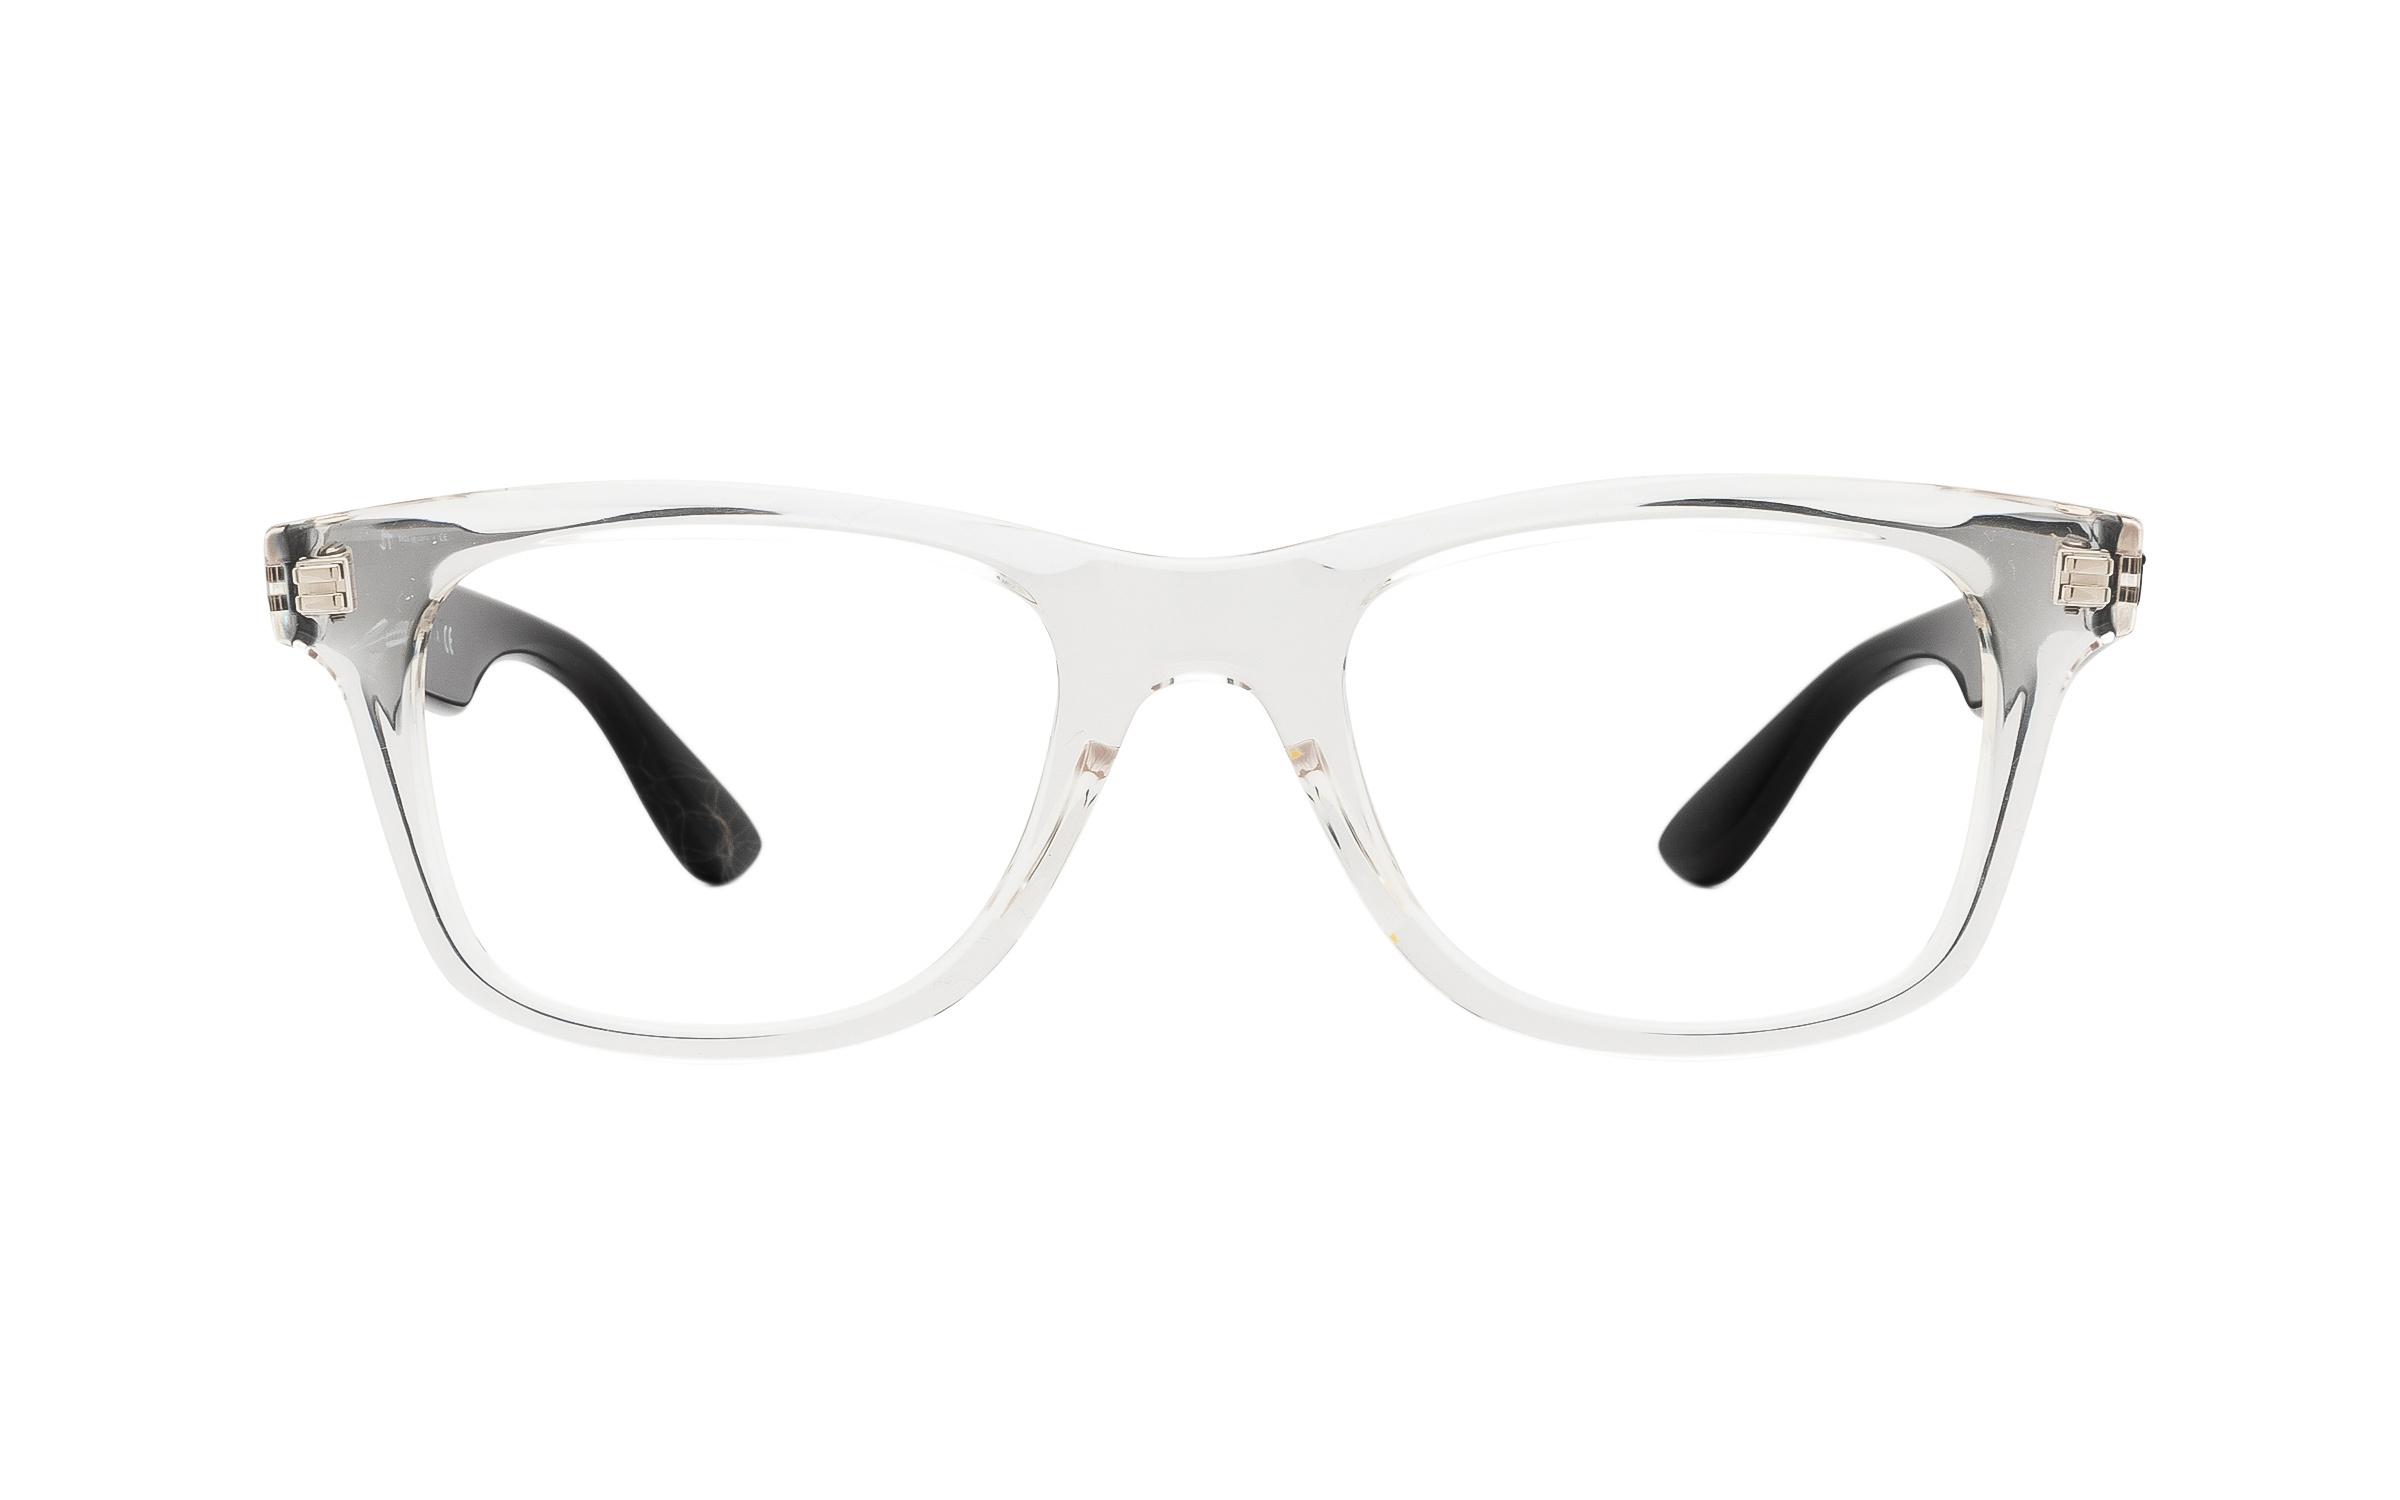 http://www.coastal.com/ - Ray-Ban RX4640V 5943 (50) Eyeglasses and Frame in Transparent Clear – Online Coastal